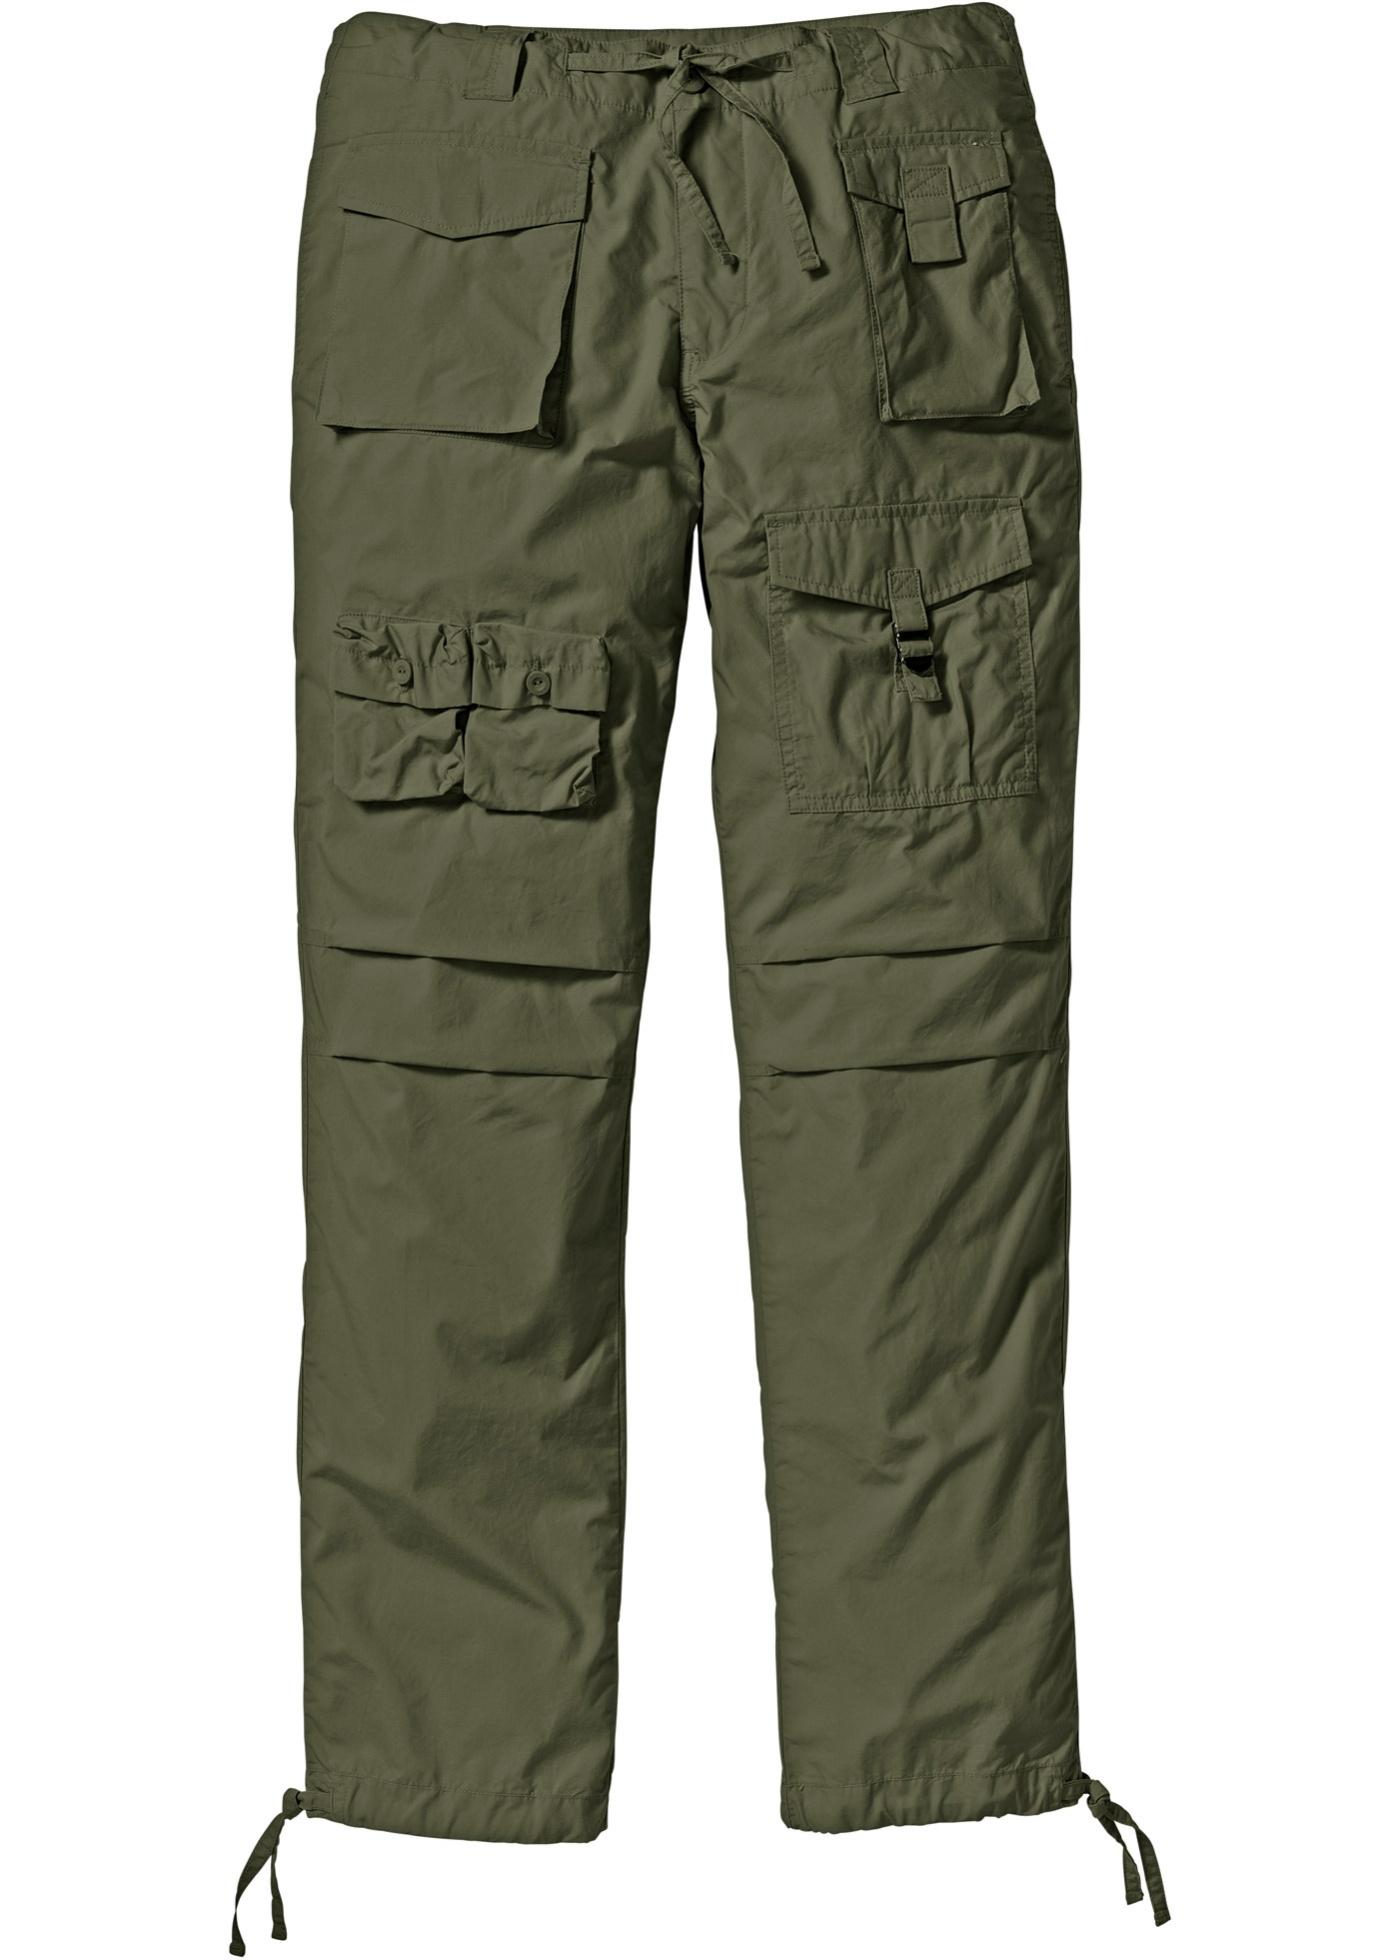 Kargo kalhoty Loose Fit - Zelená